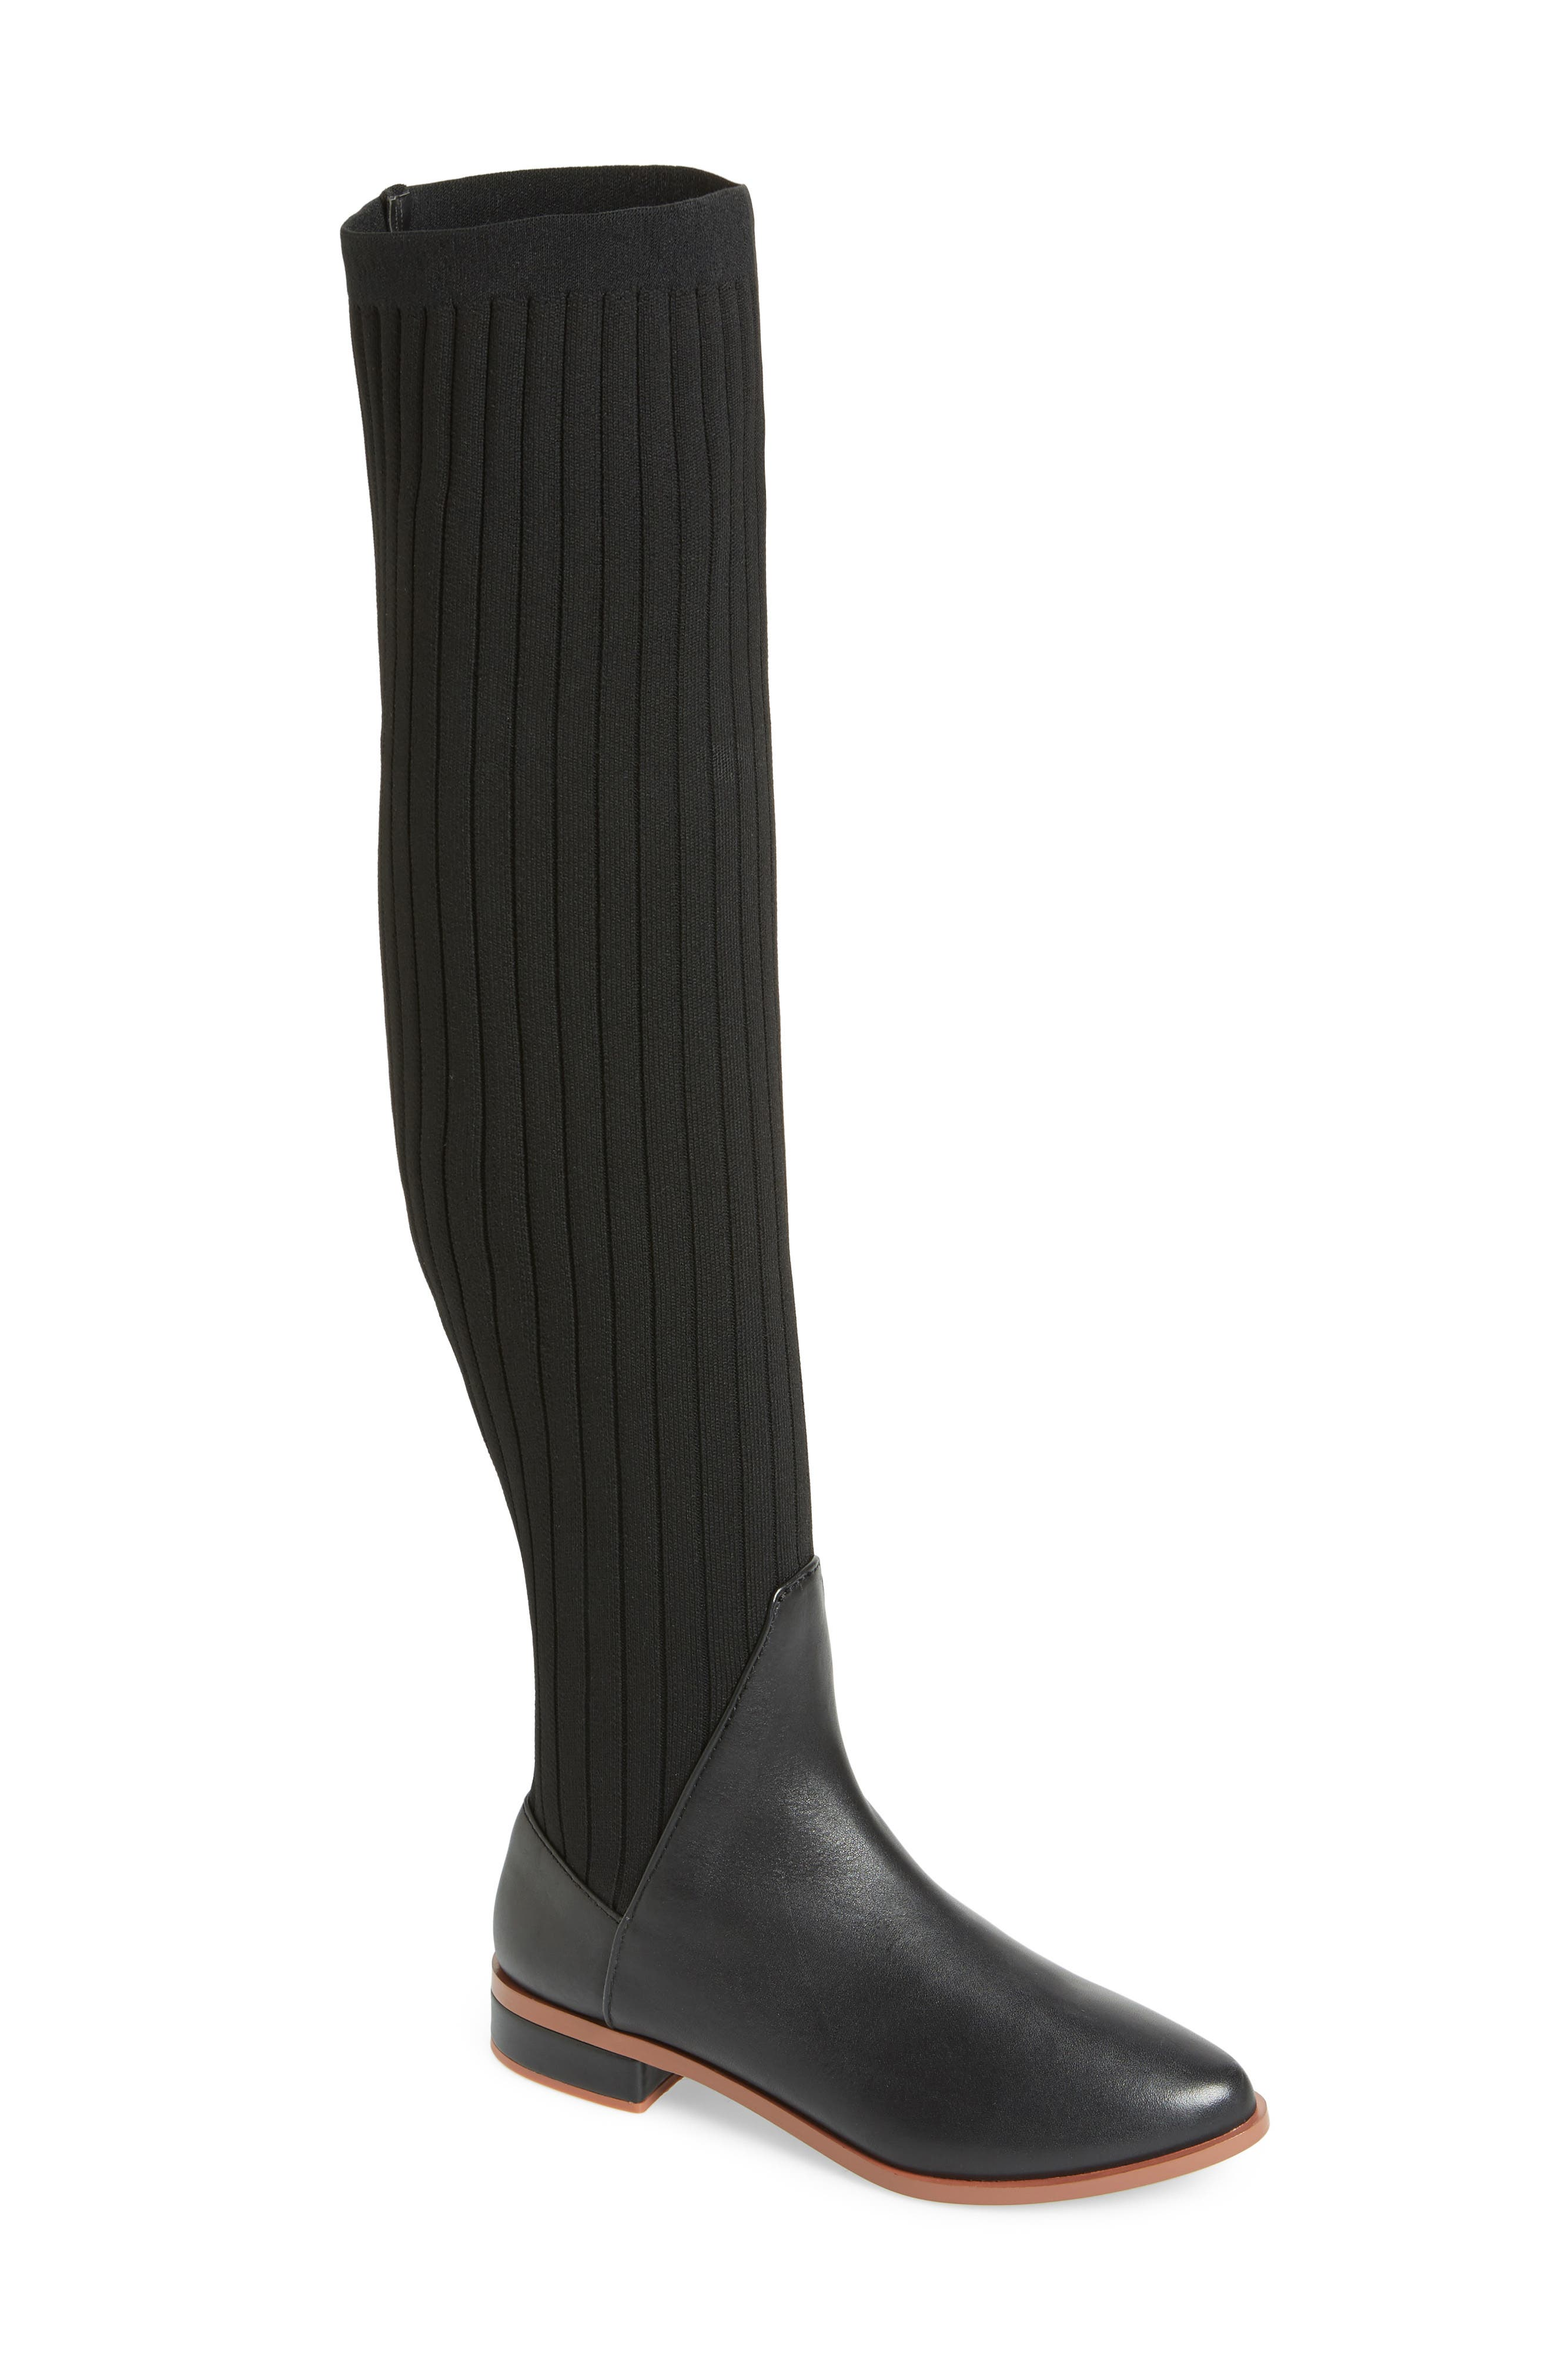 Kelsi Dagger Brooklyn Alva Over The Knee Sock Knit Boot- Black